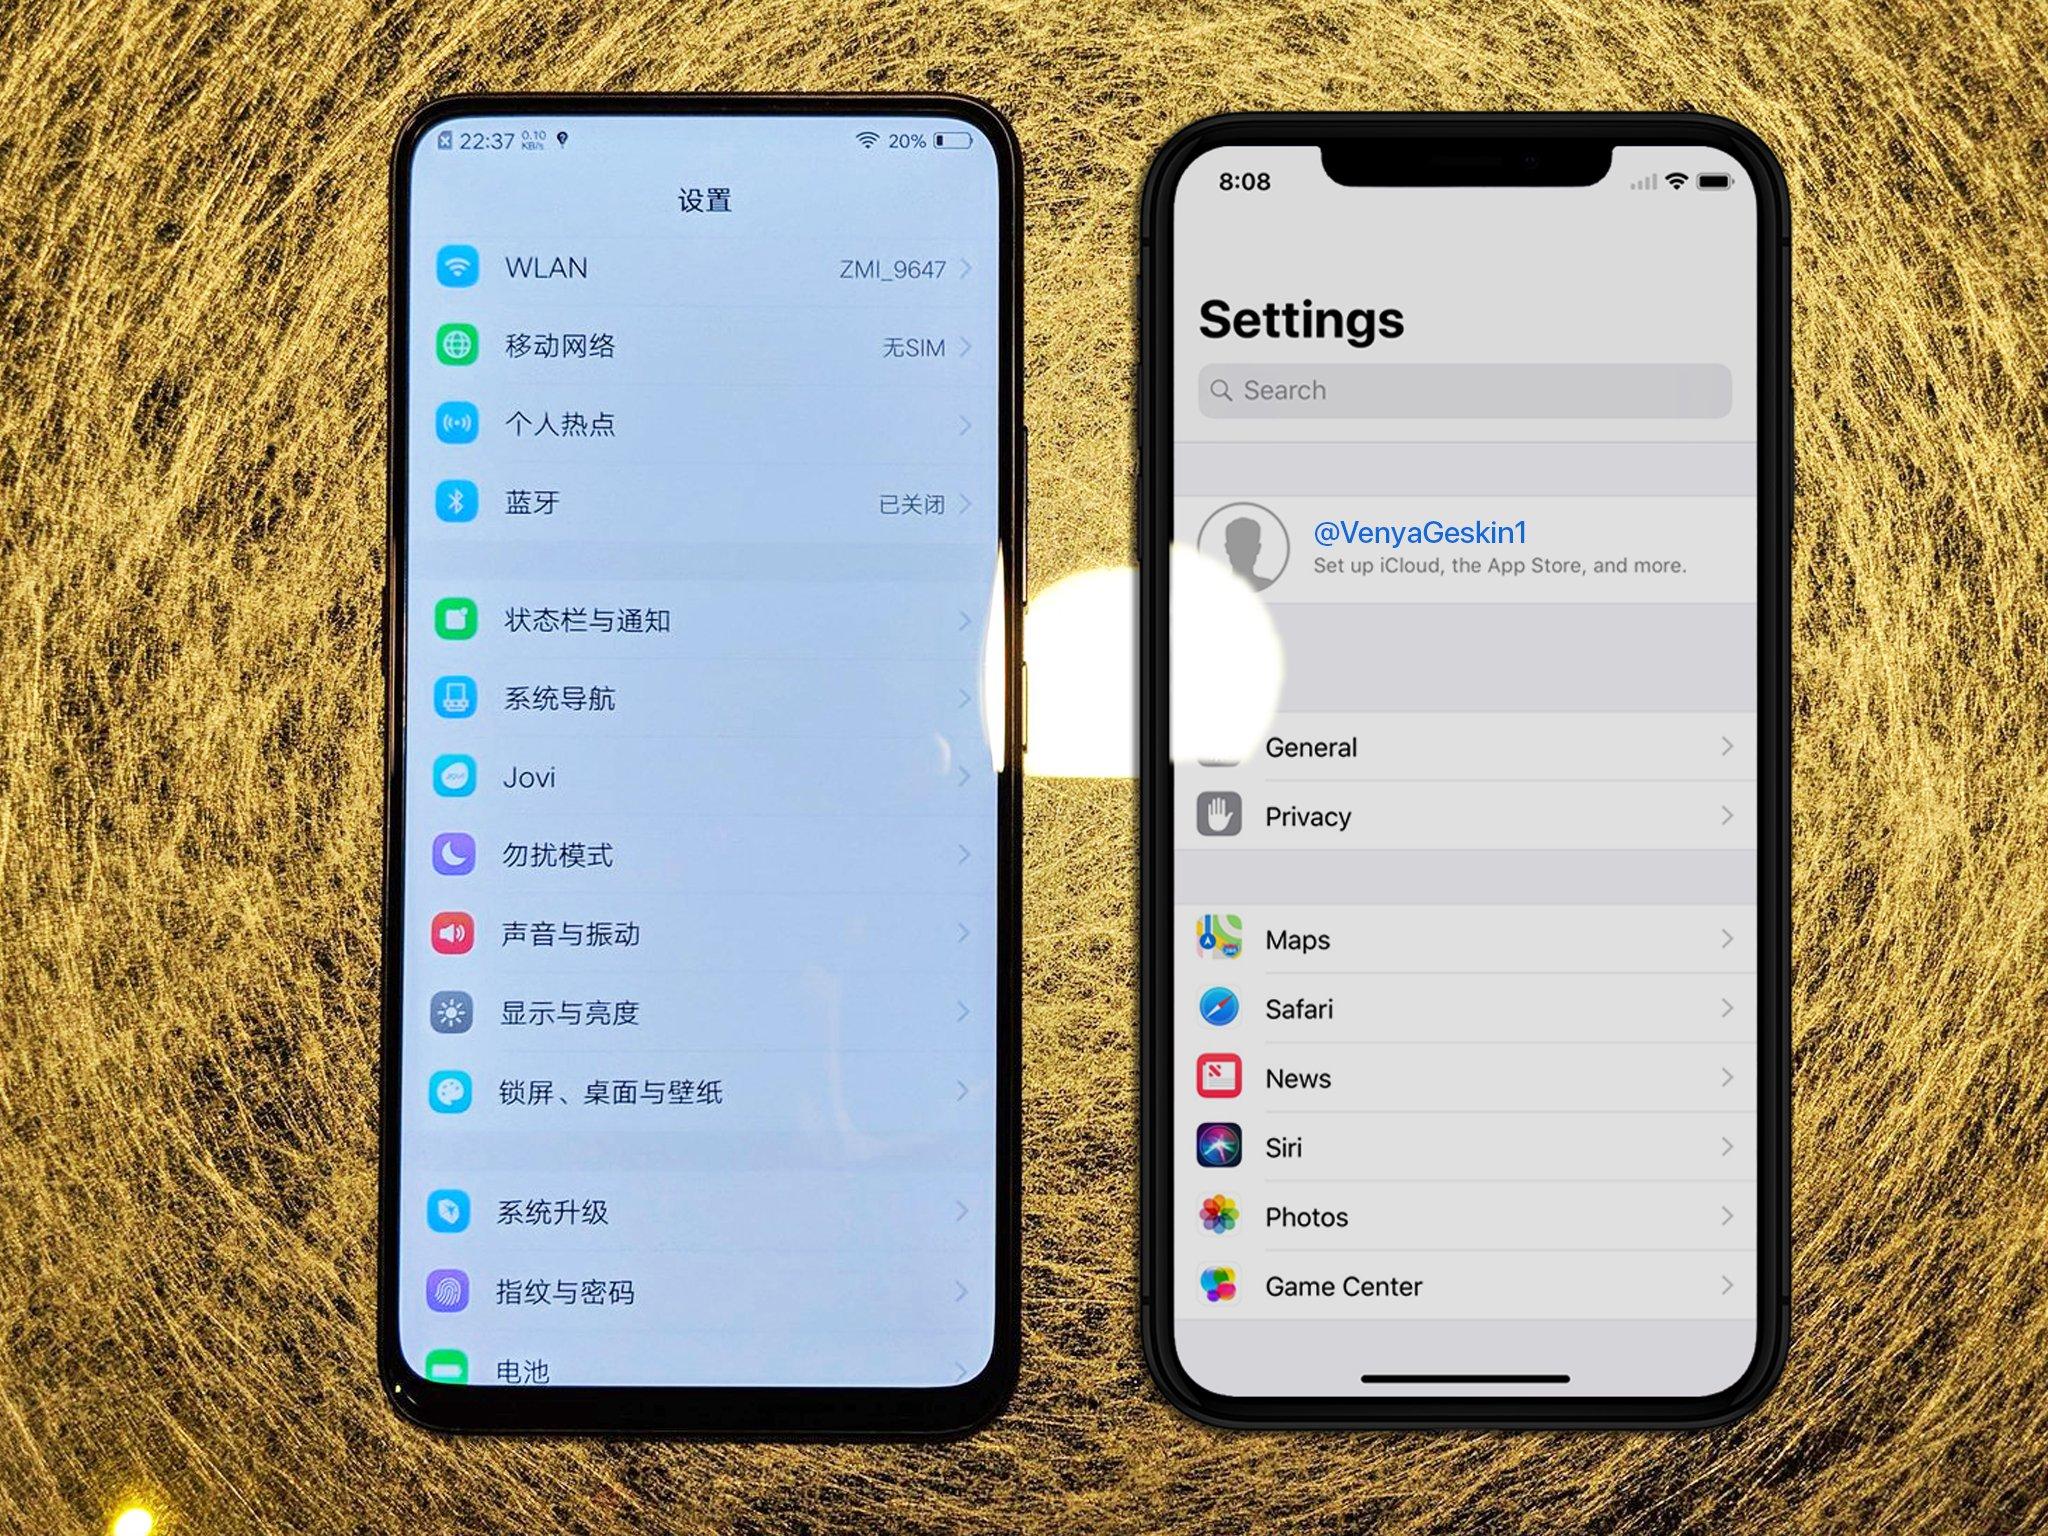 Vivo NEX iPhone X Plus Comparatia Ecranelor 1